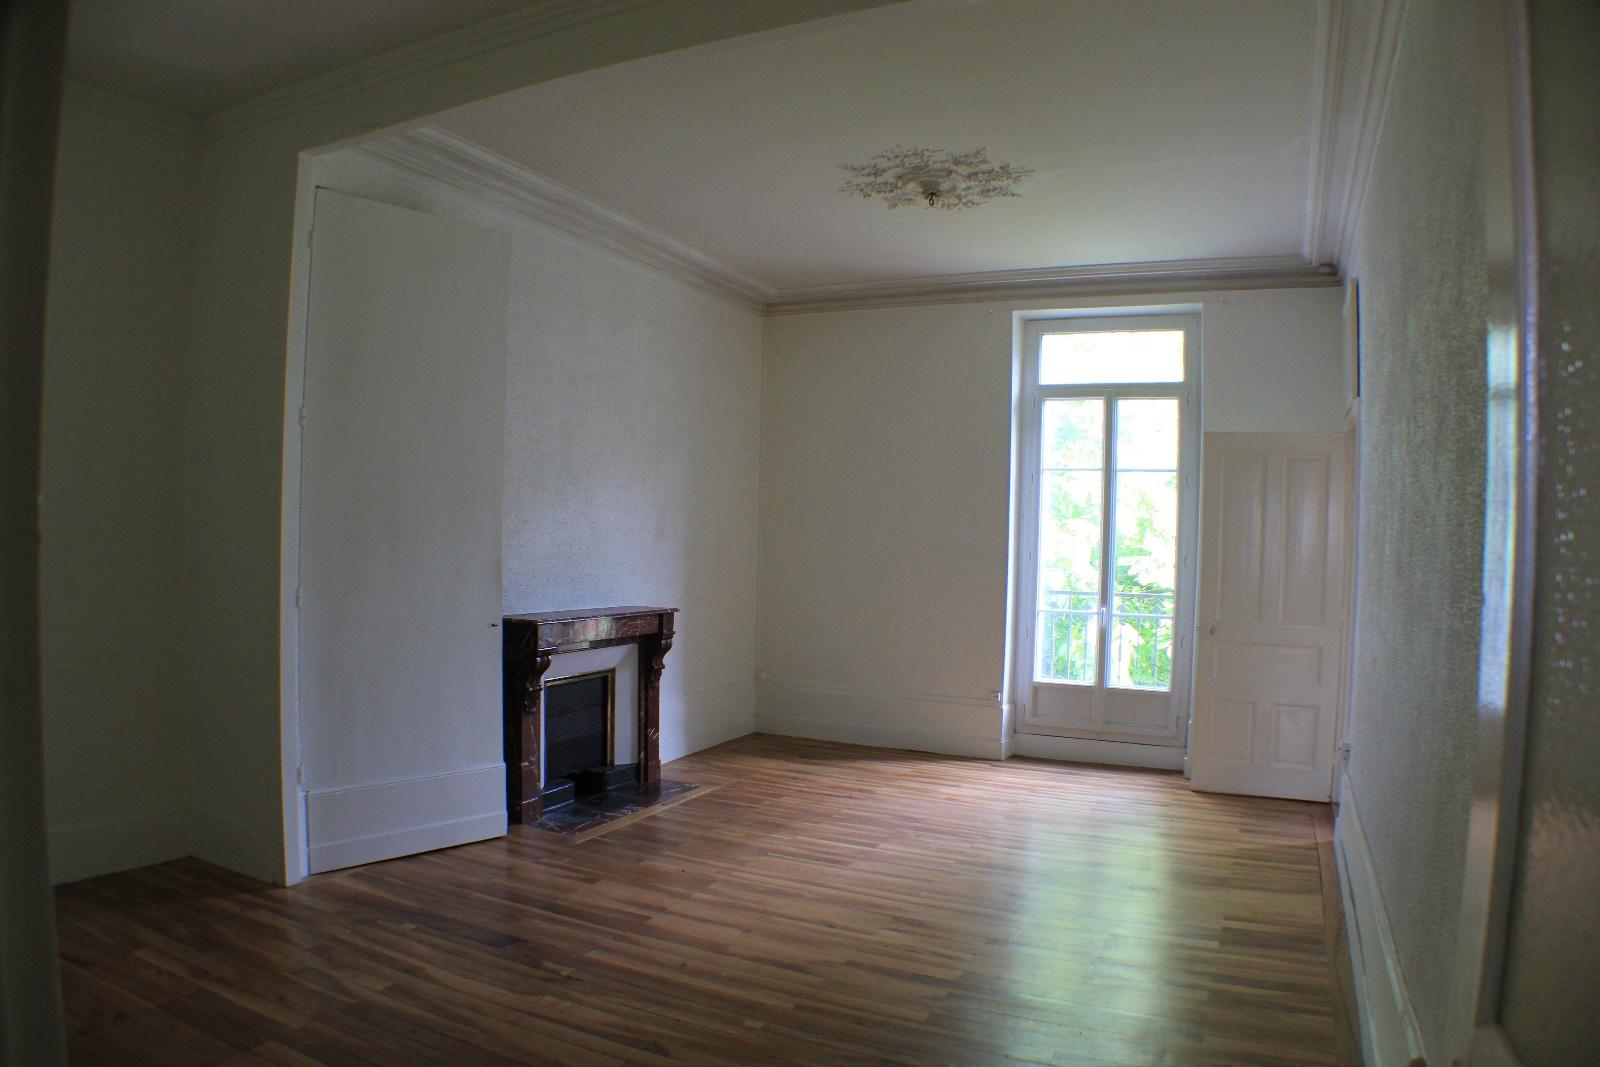 vente grenoble alsace lorraine bel ancien avec ascenseur. Black Bedroom Furniture Sets. Home Design Ideas